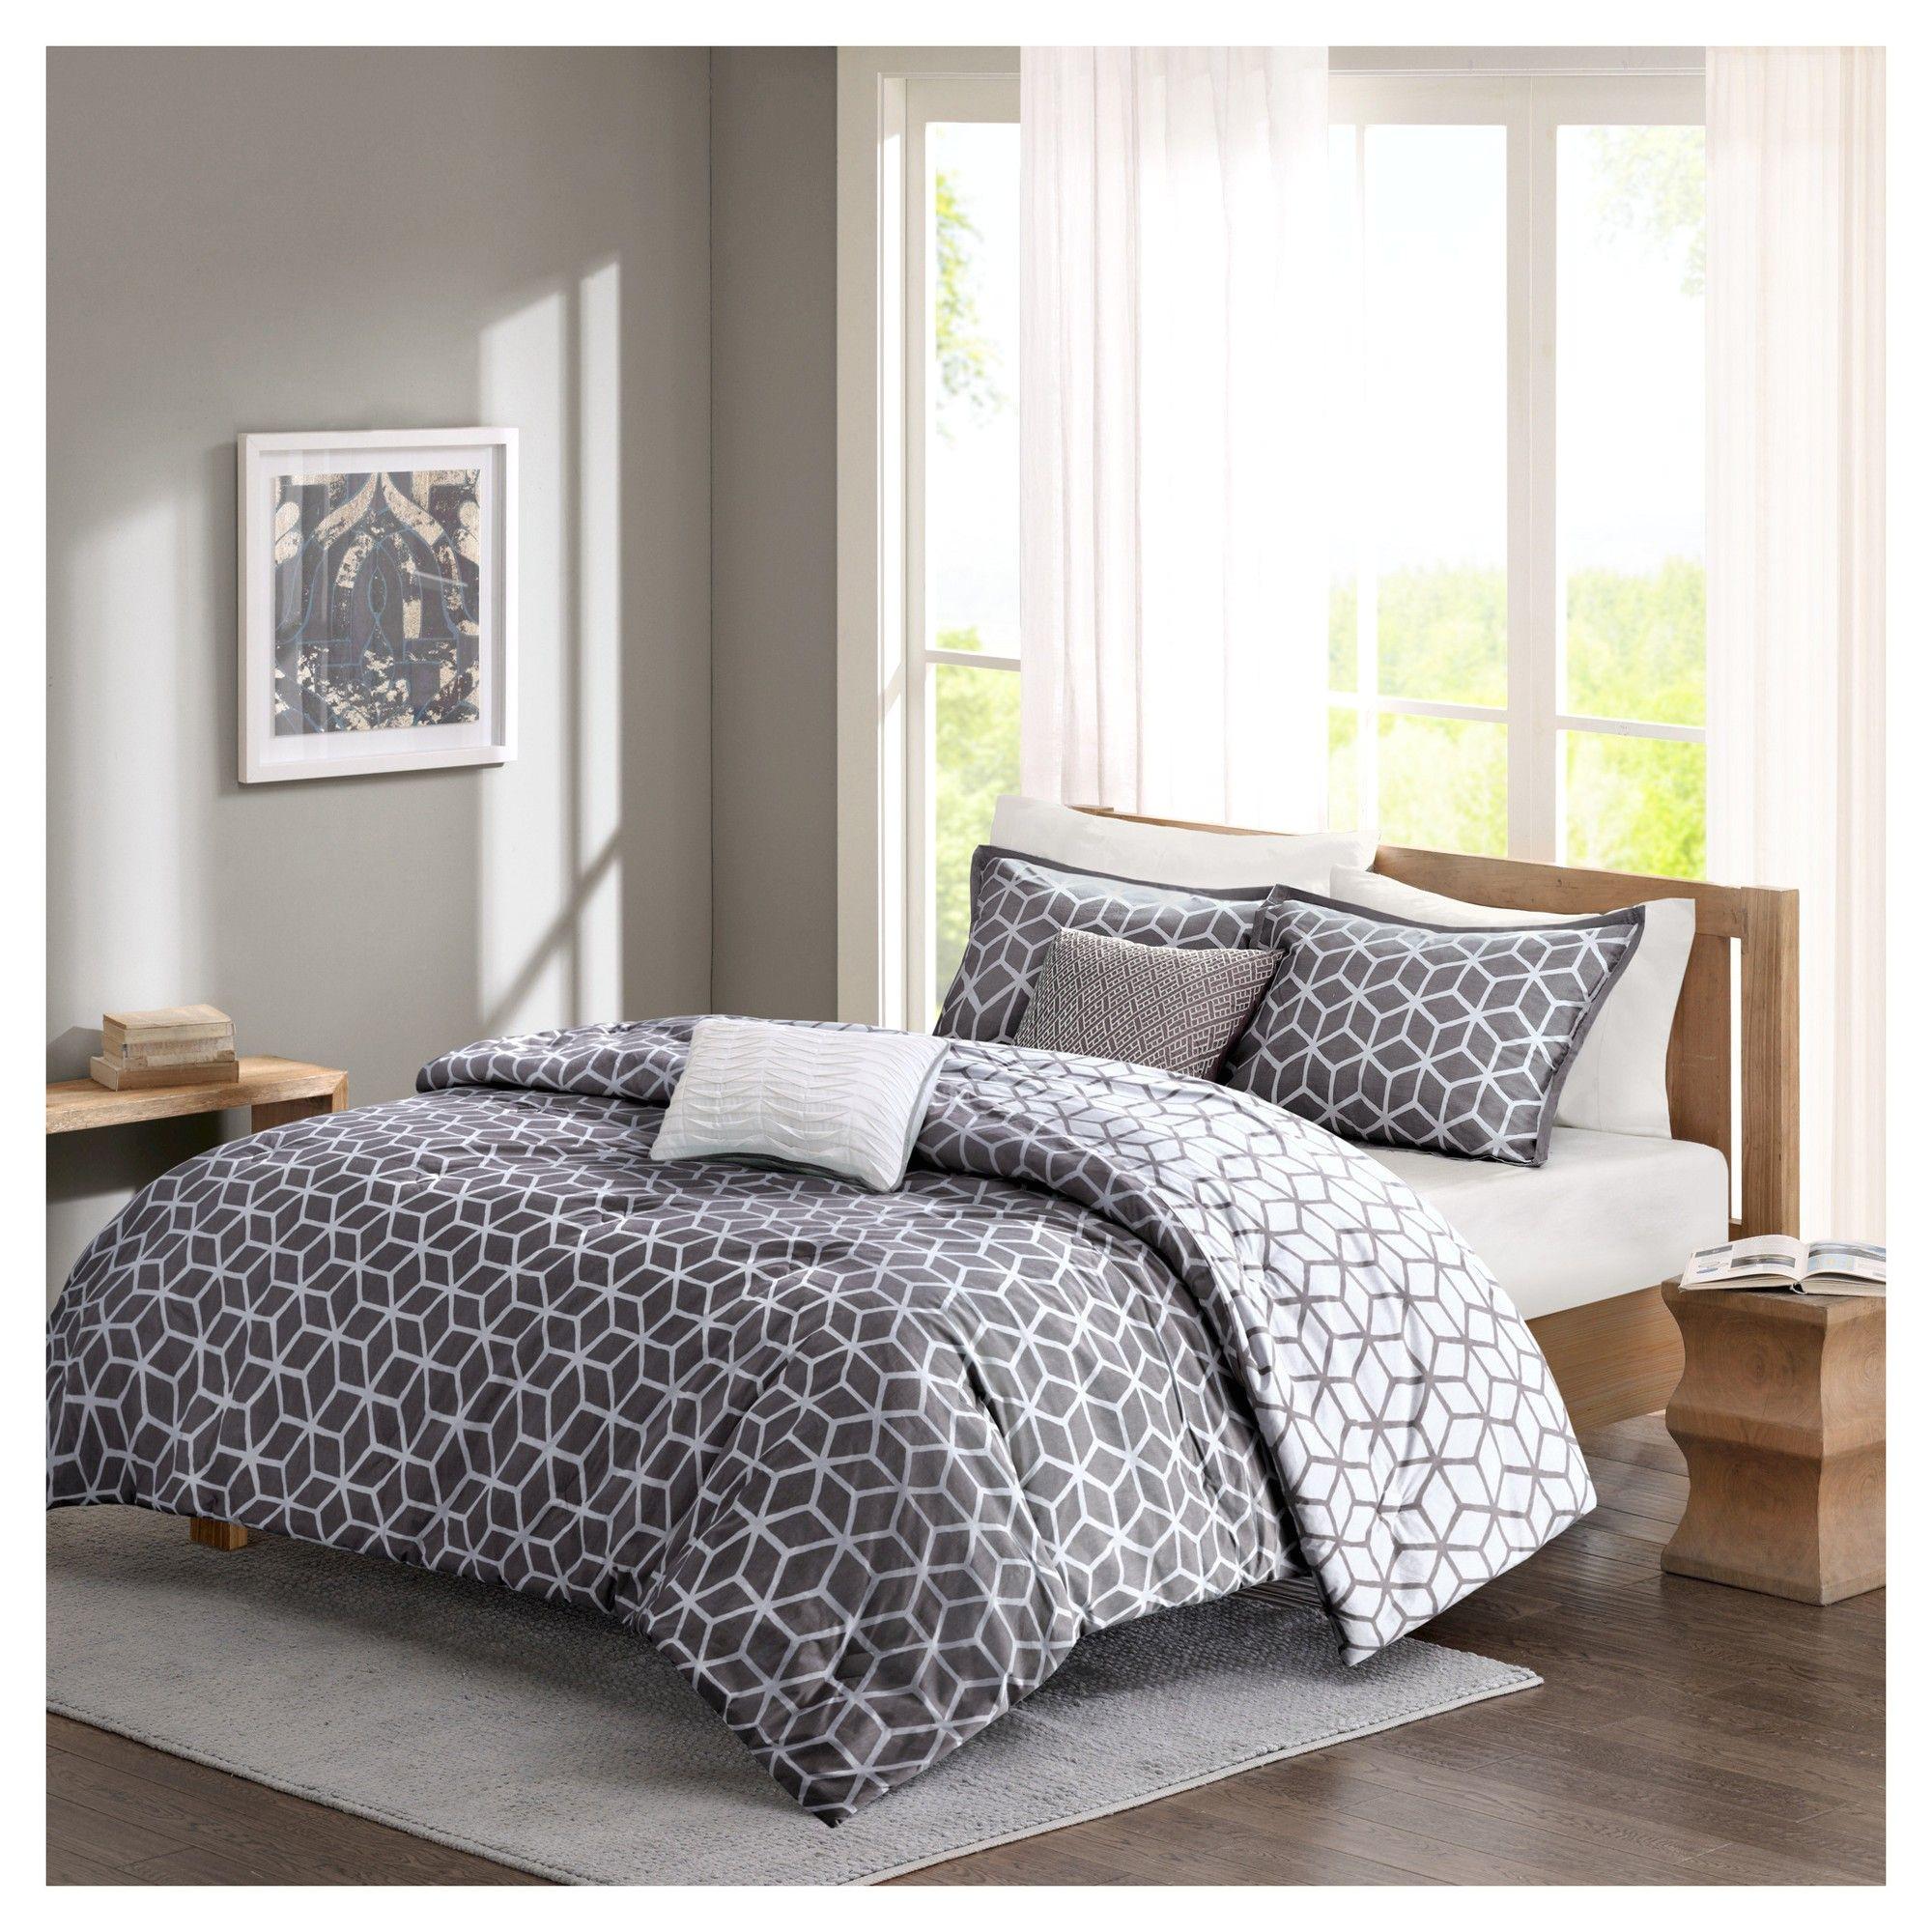 gianna geometric cotton comforter set king california king 5 piece gray